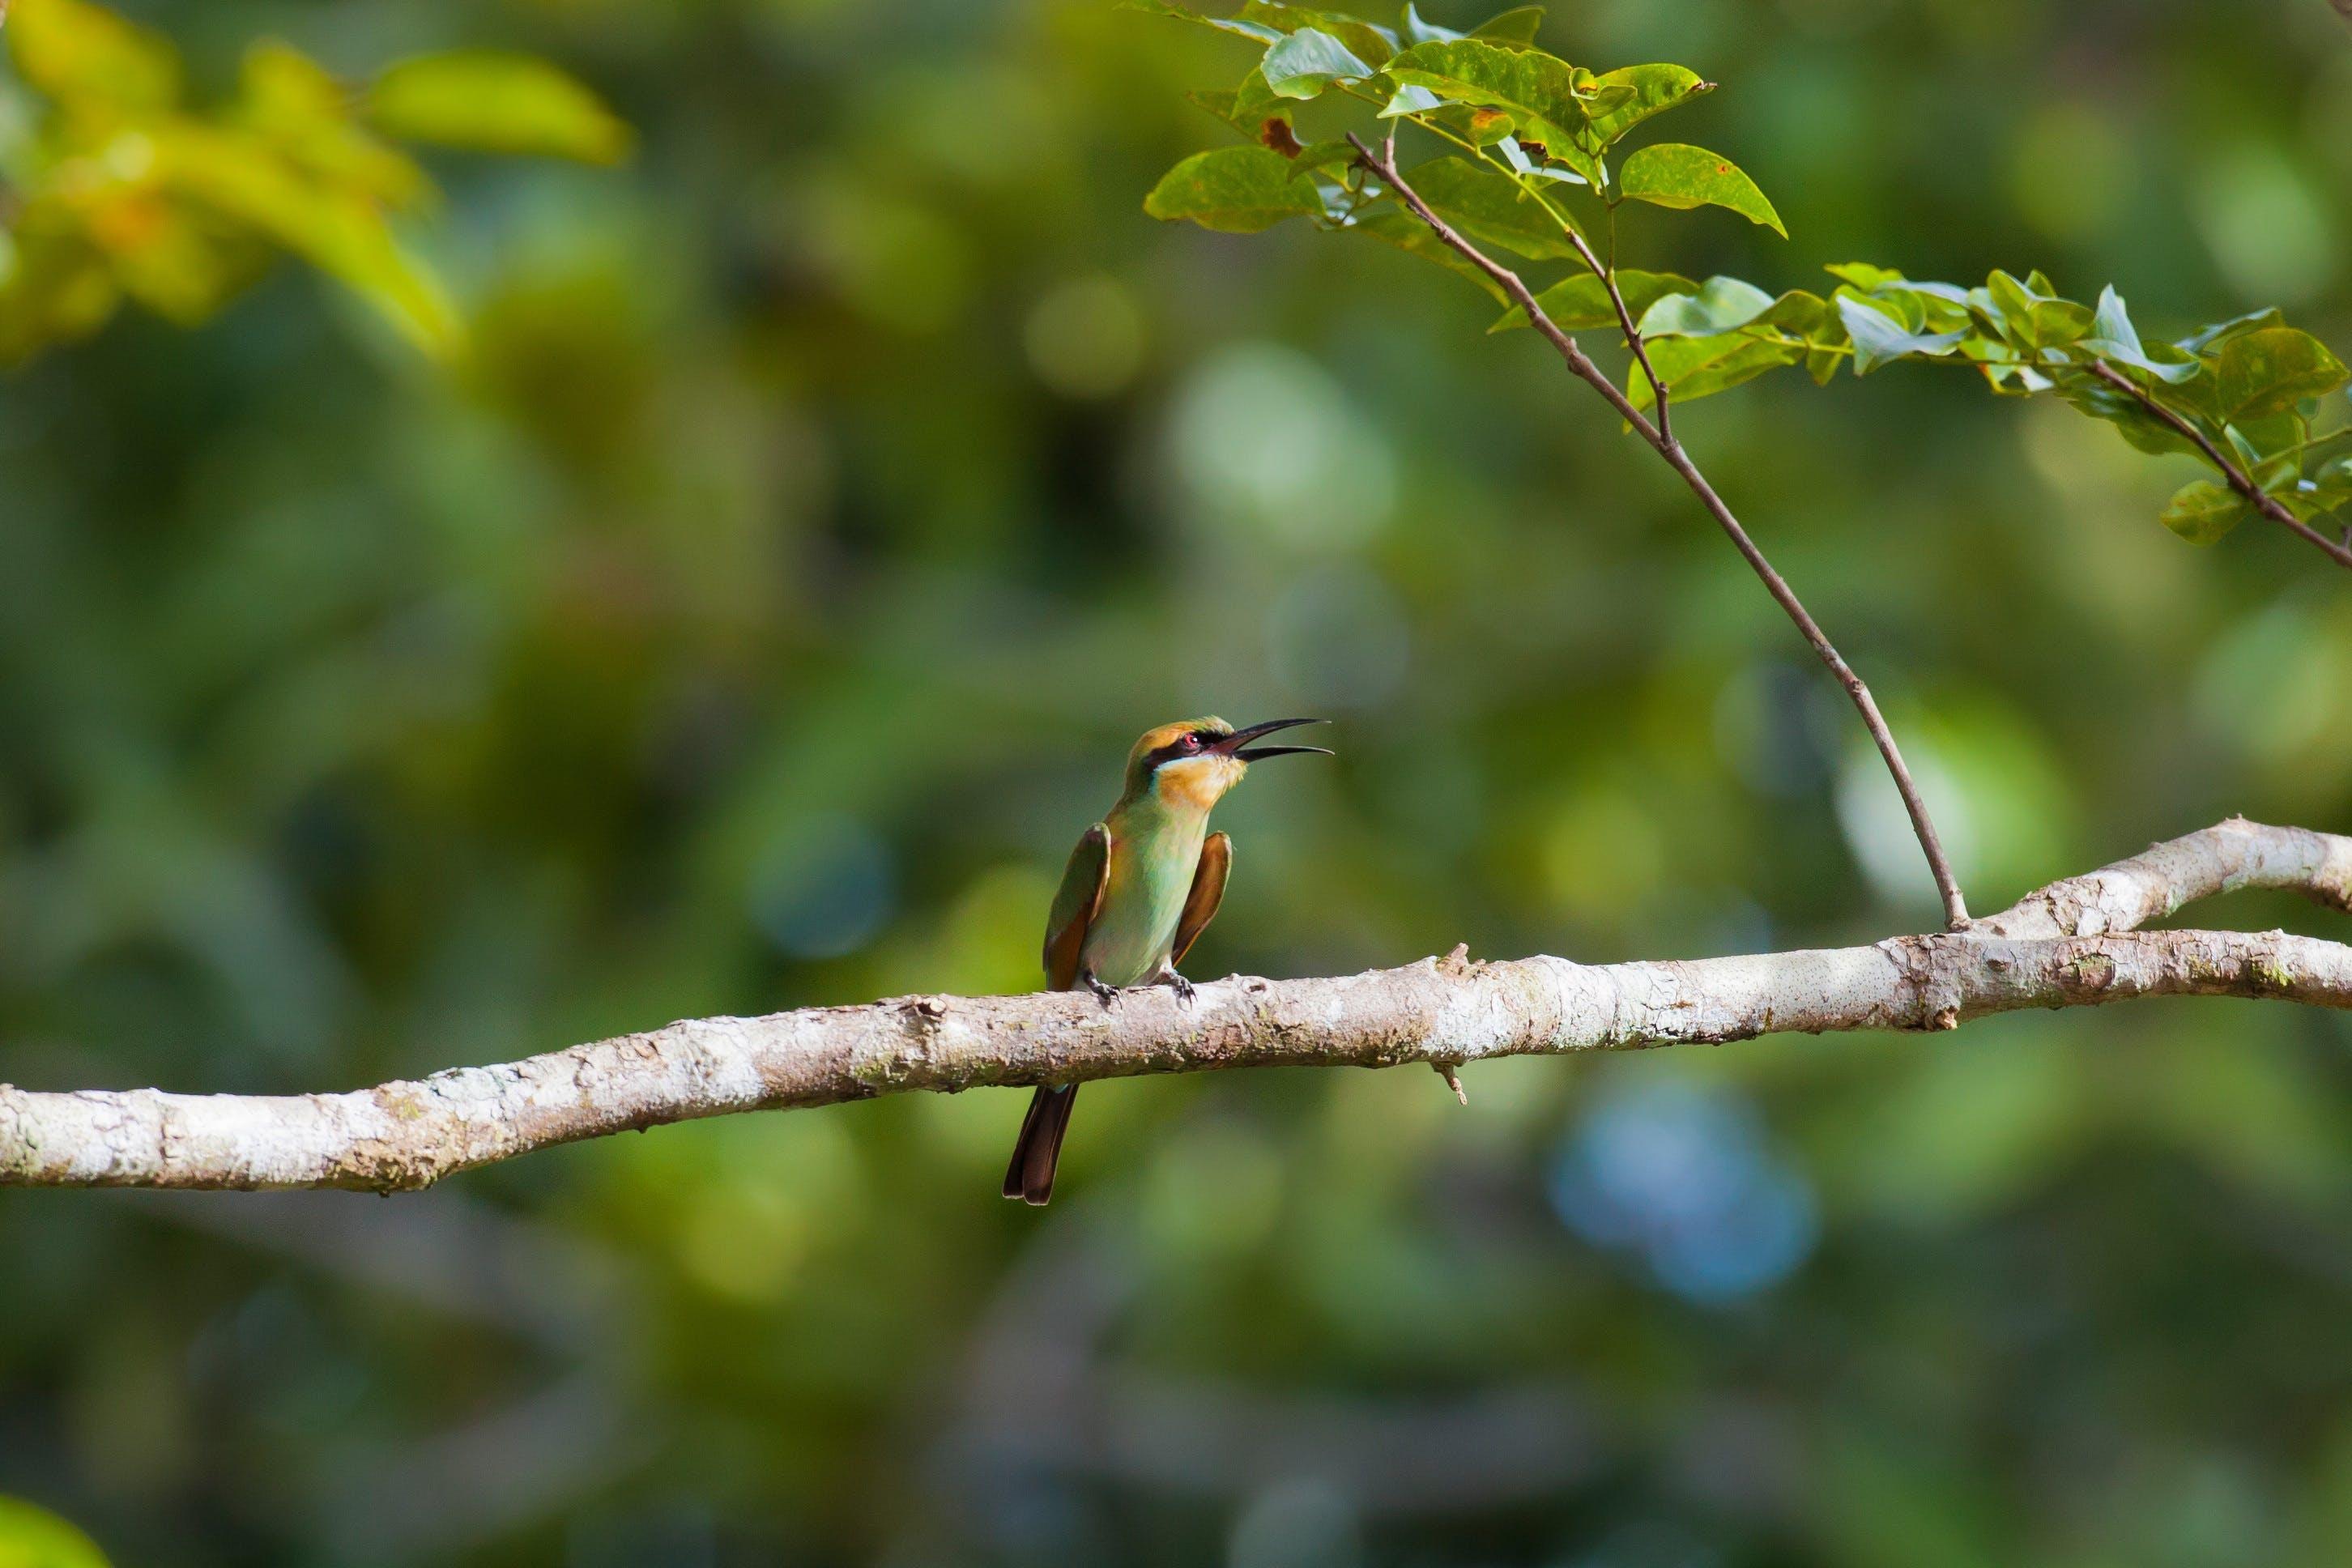 Green Hummingbird on Tree Trunk